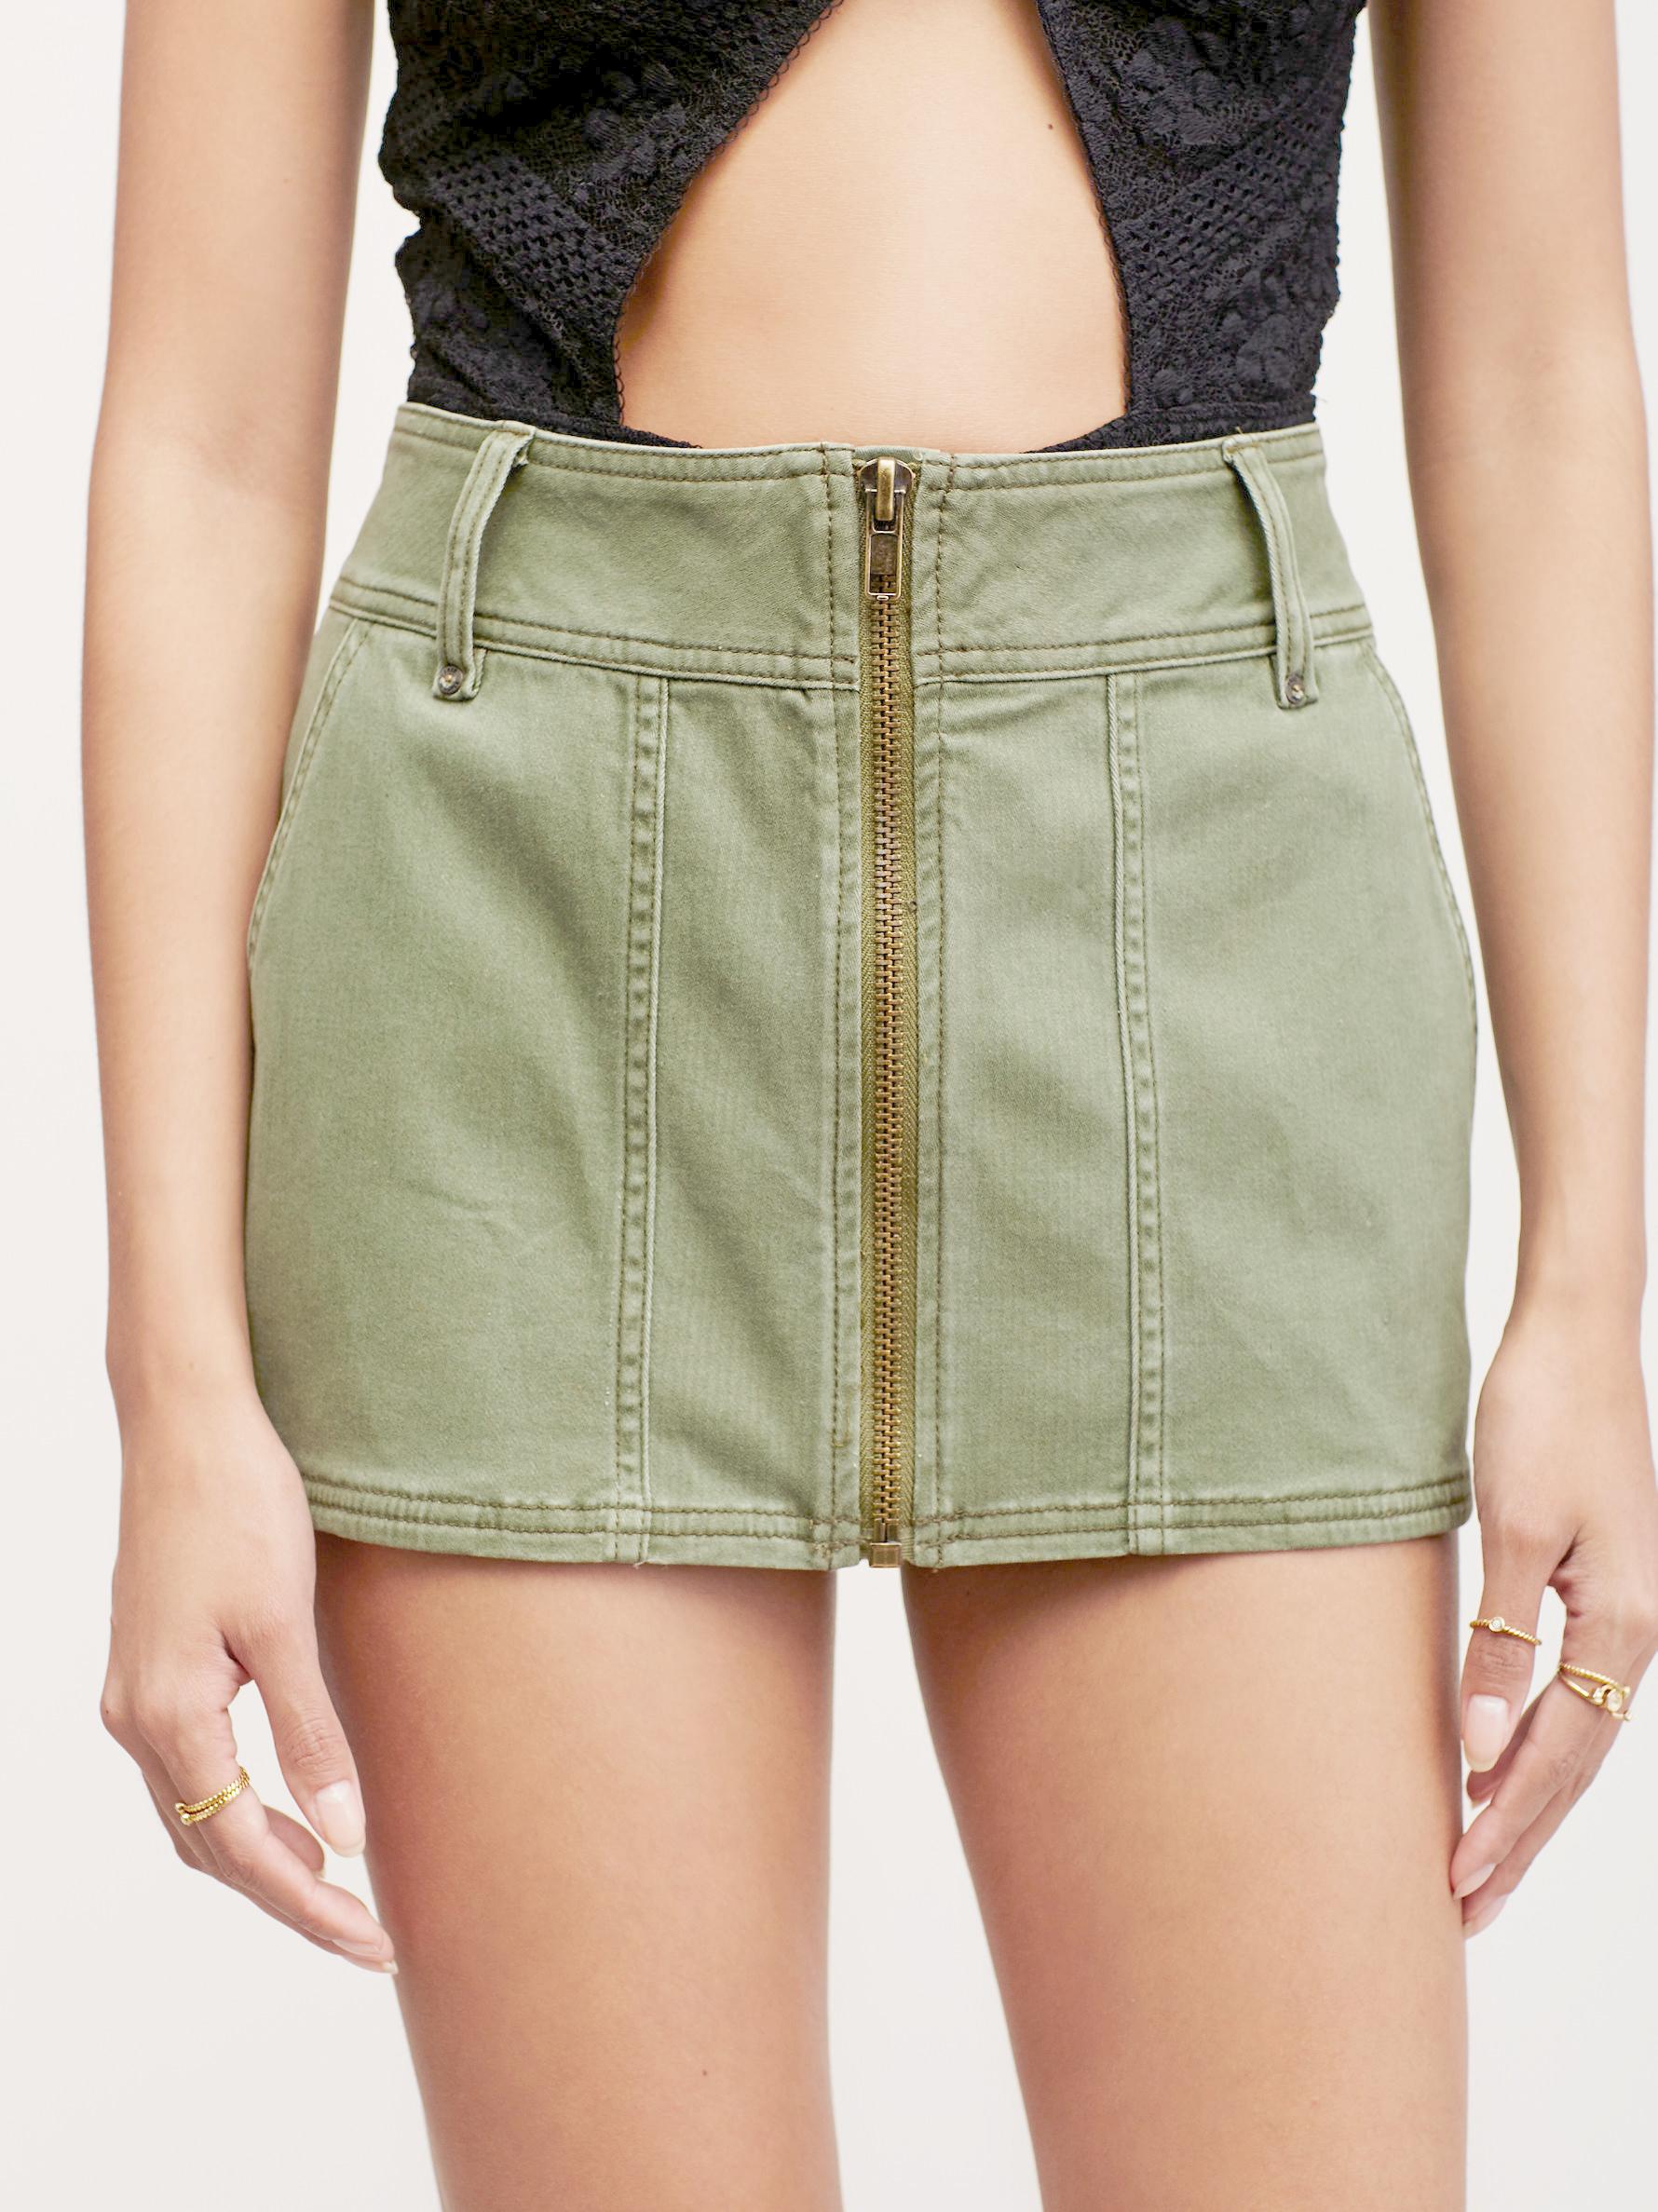 Free short skirt pics